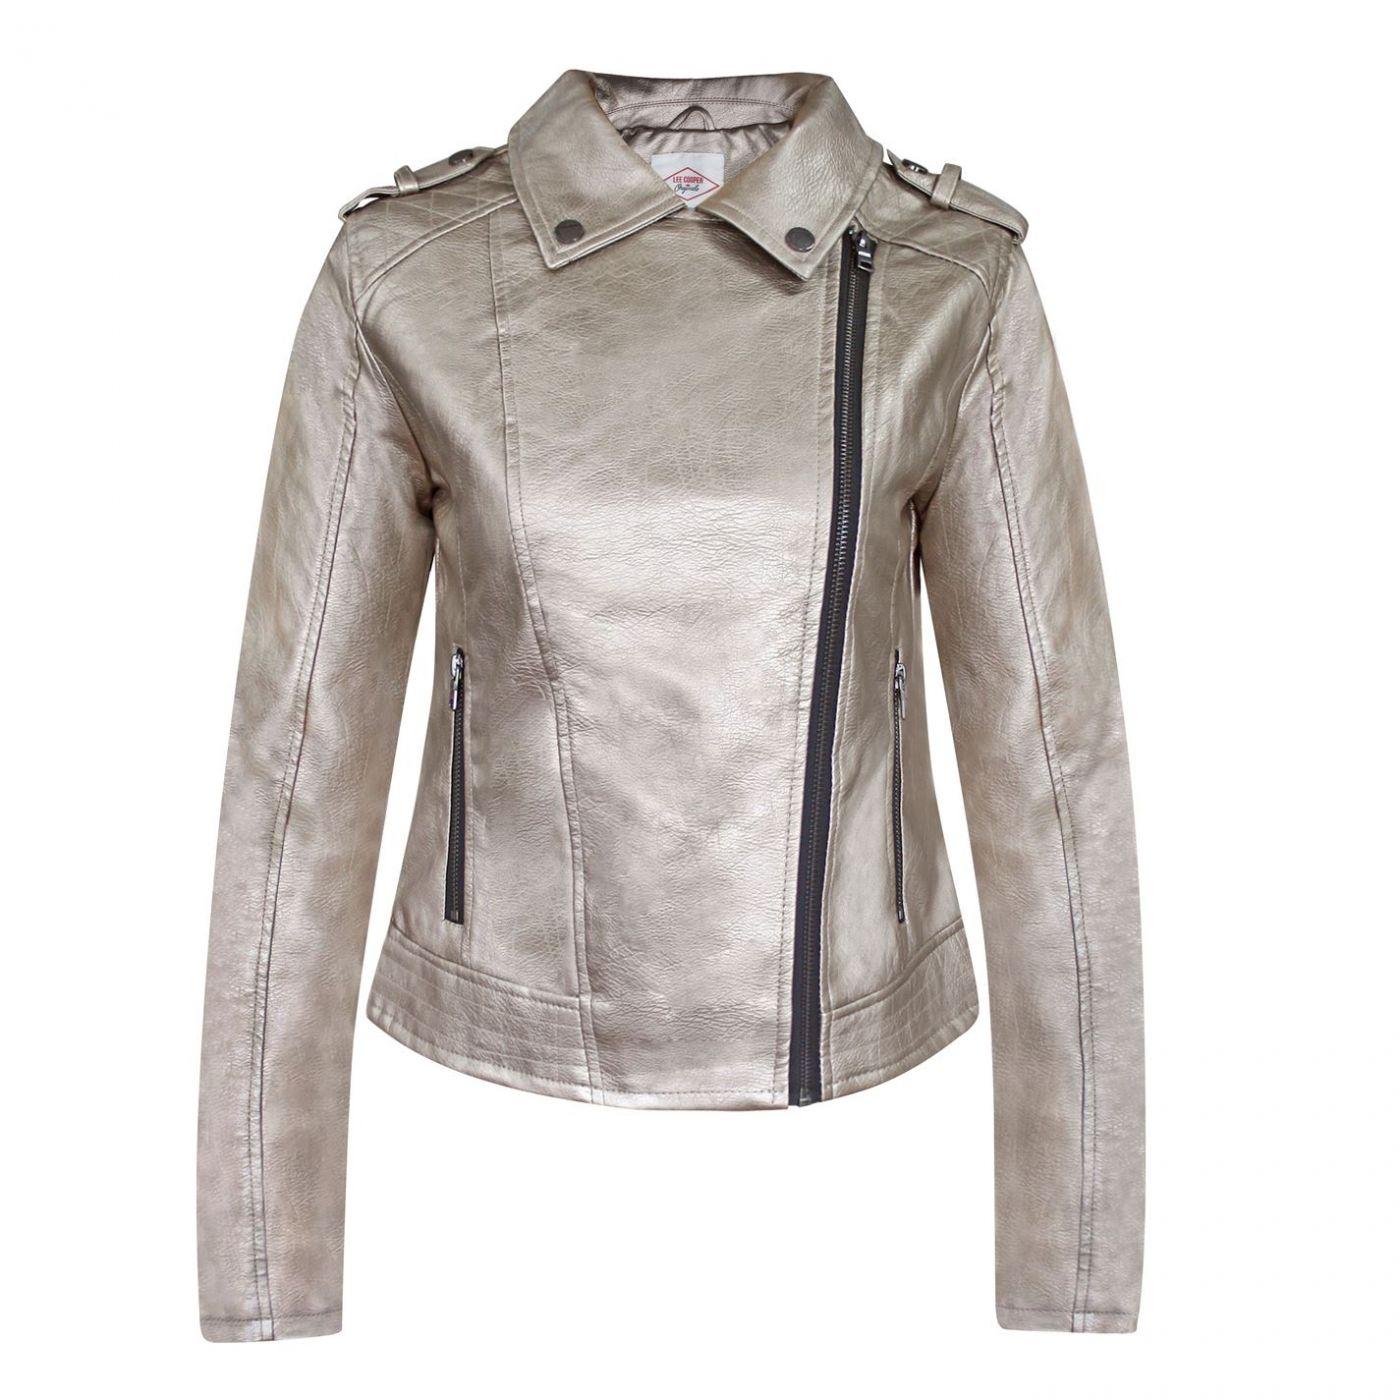 Lee Cooper Zip PU Jacket Ladies